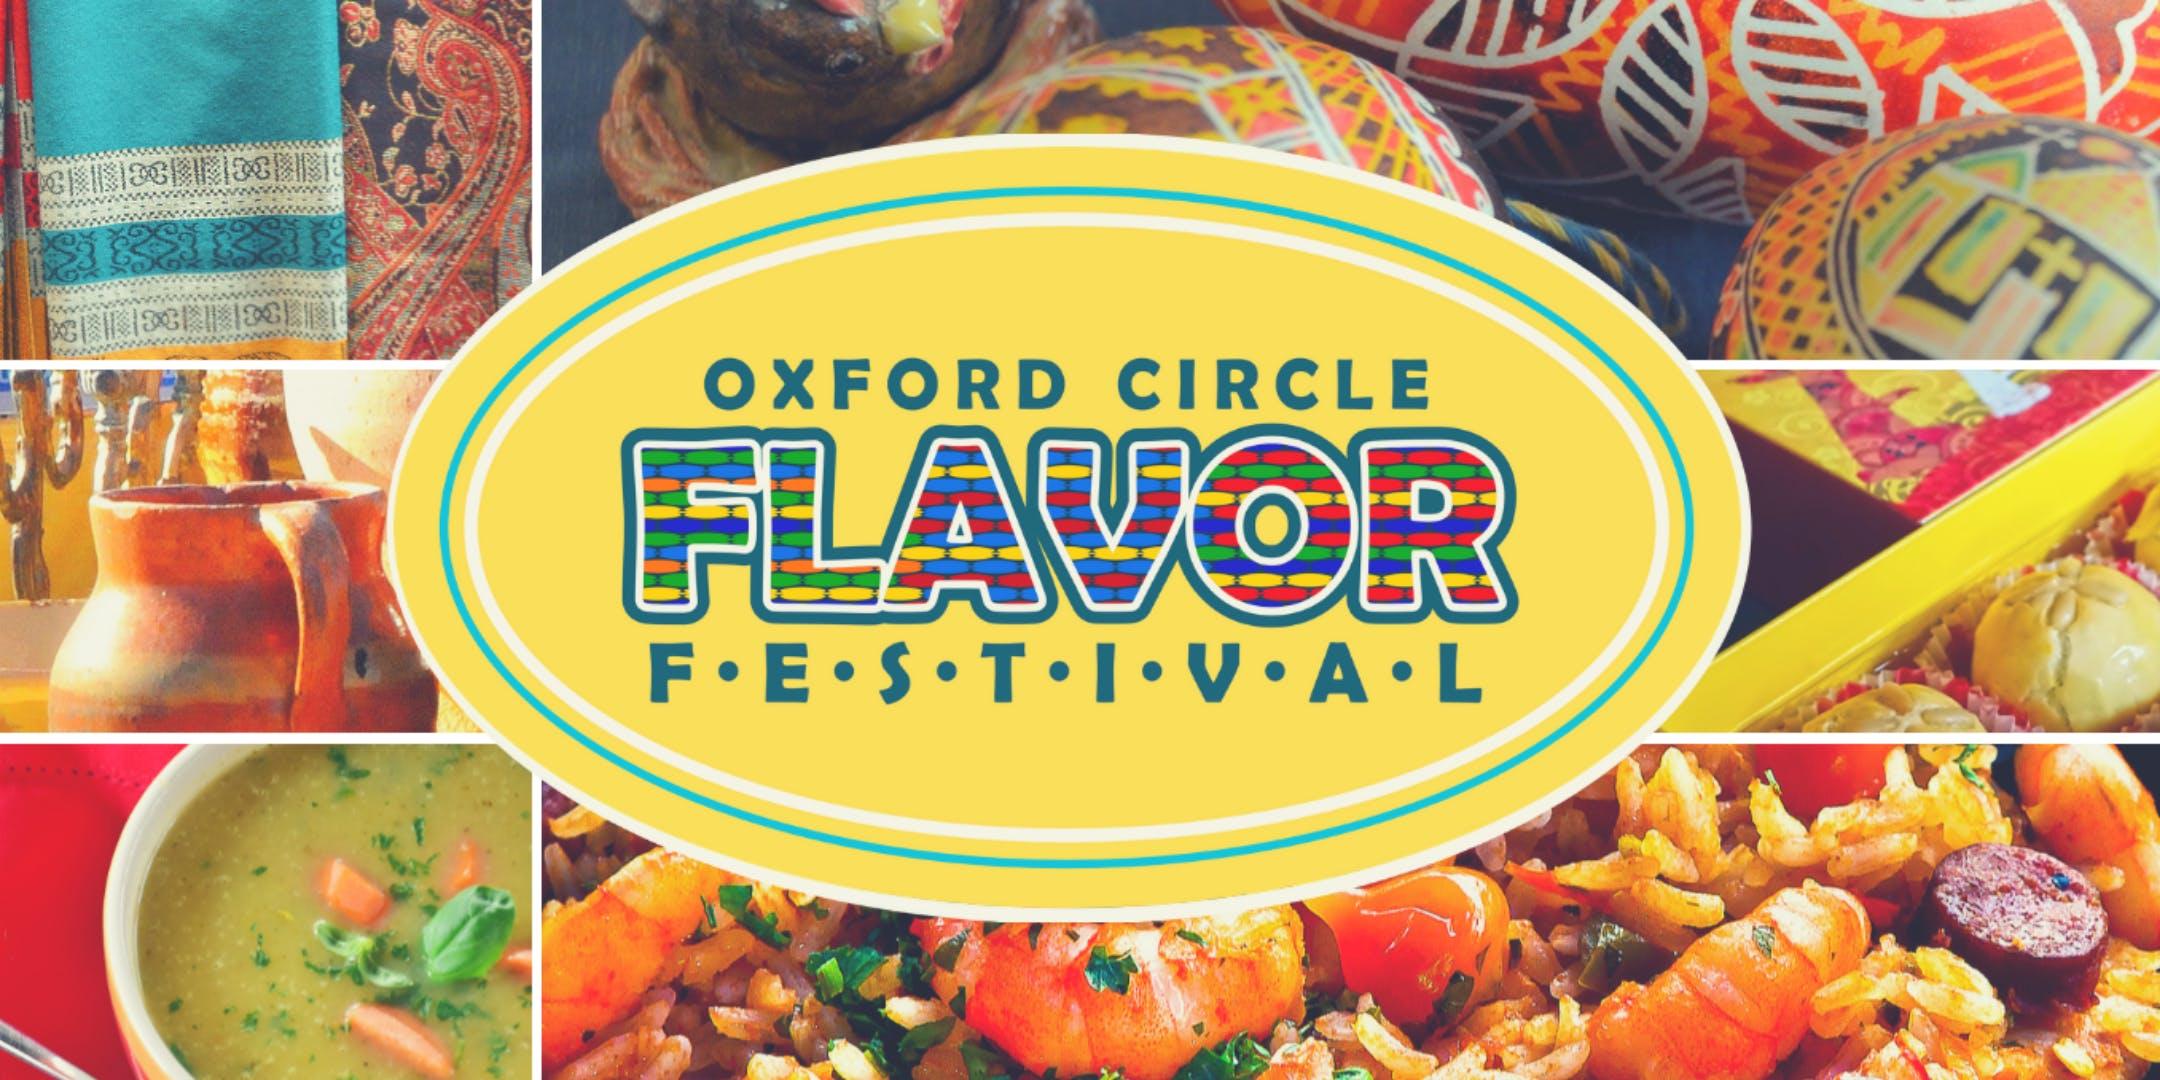 The Oxford Circle Flavor Festival